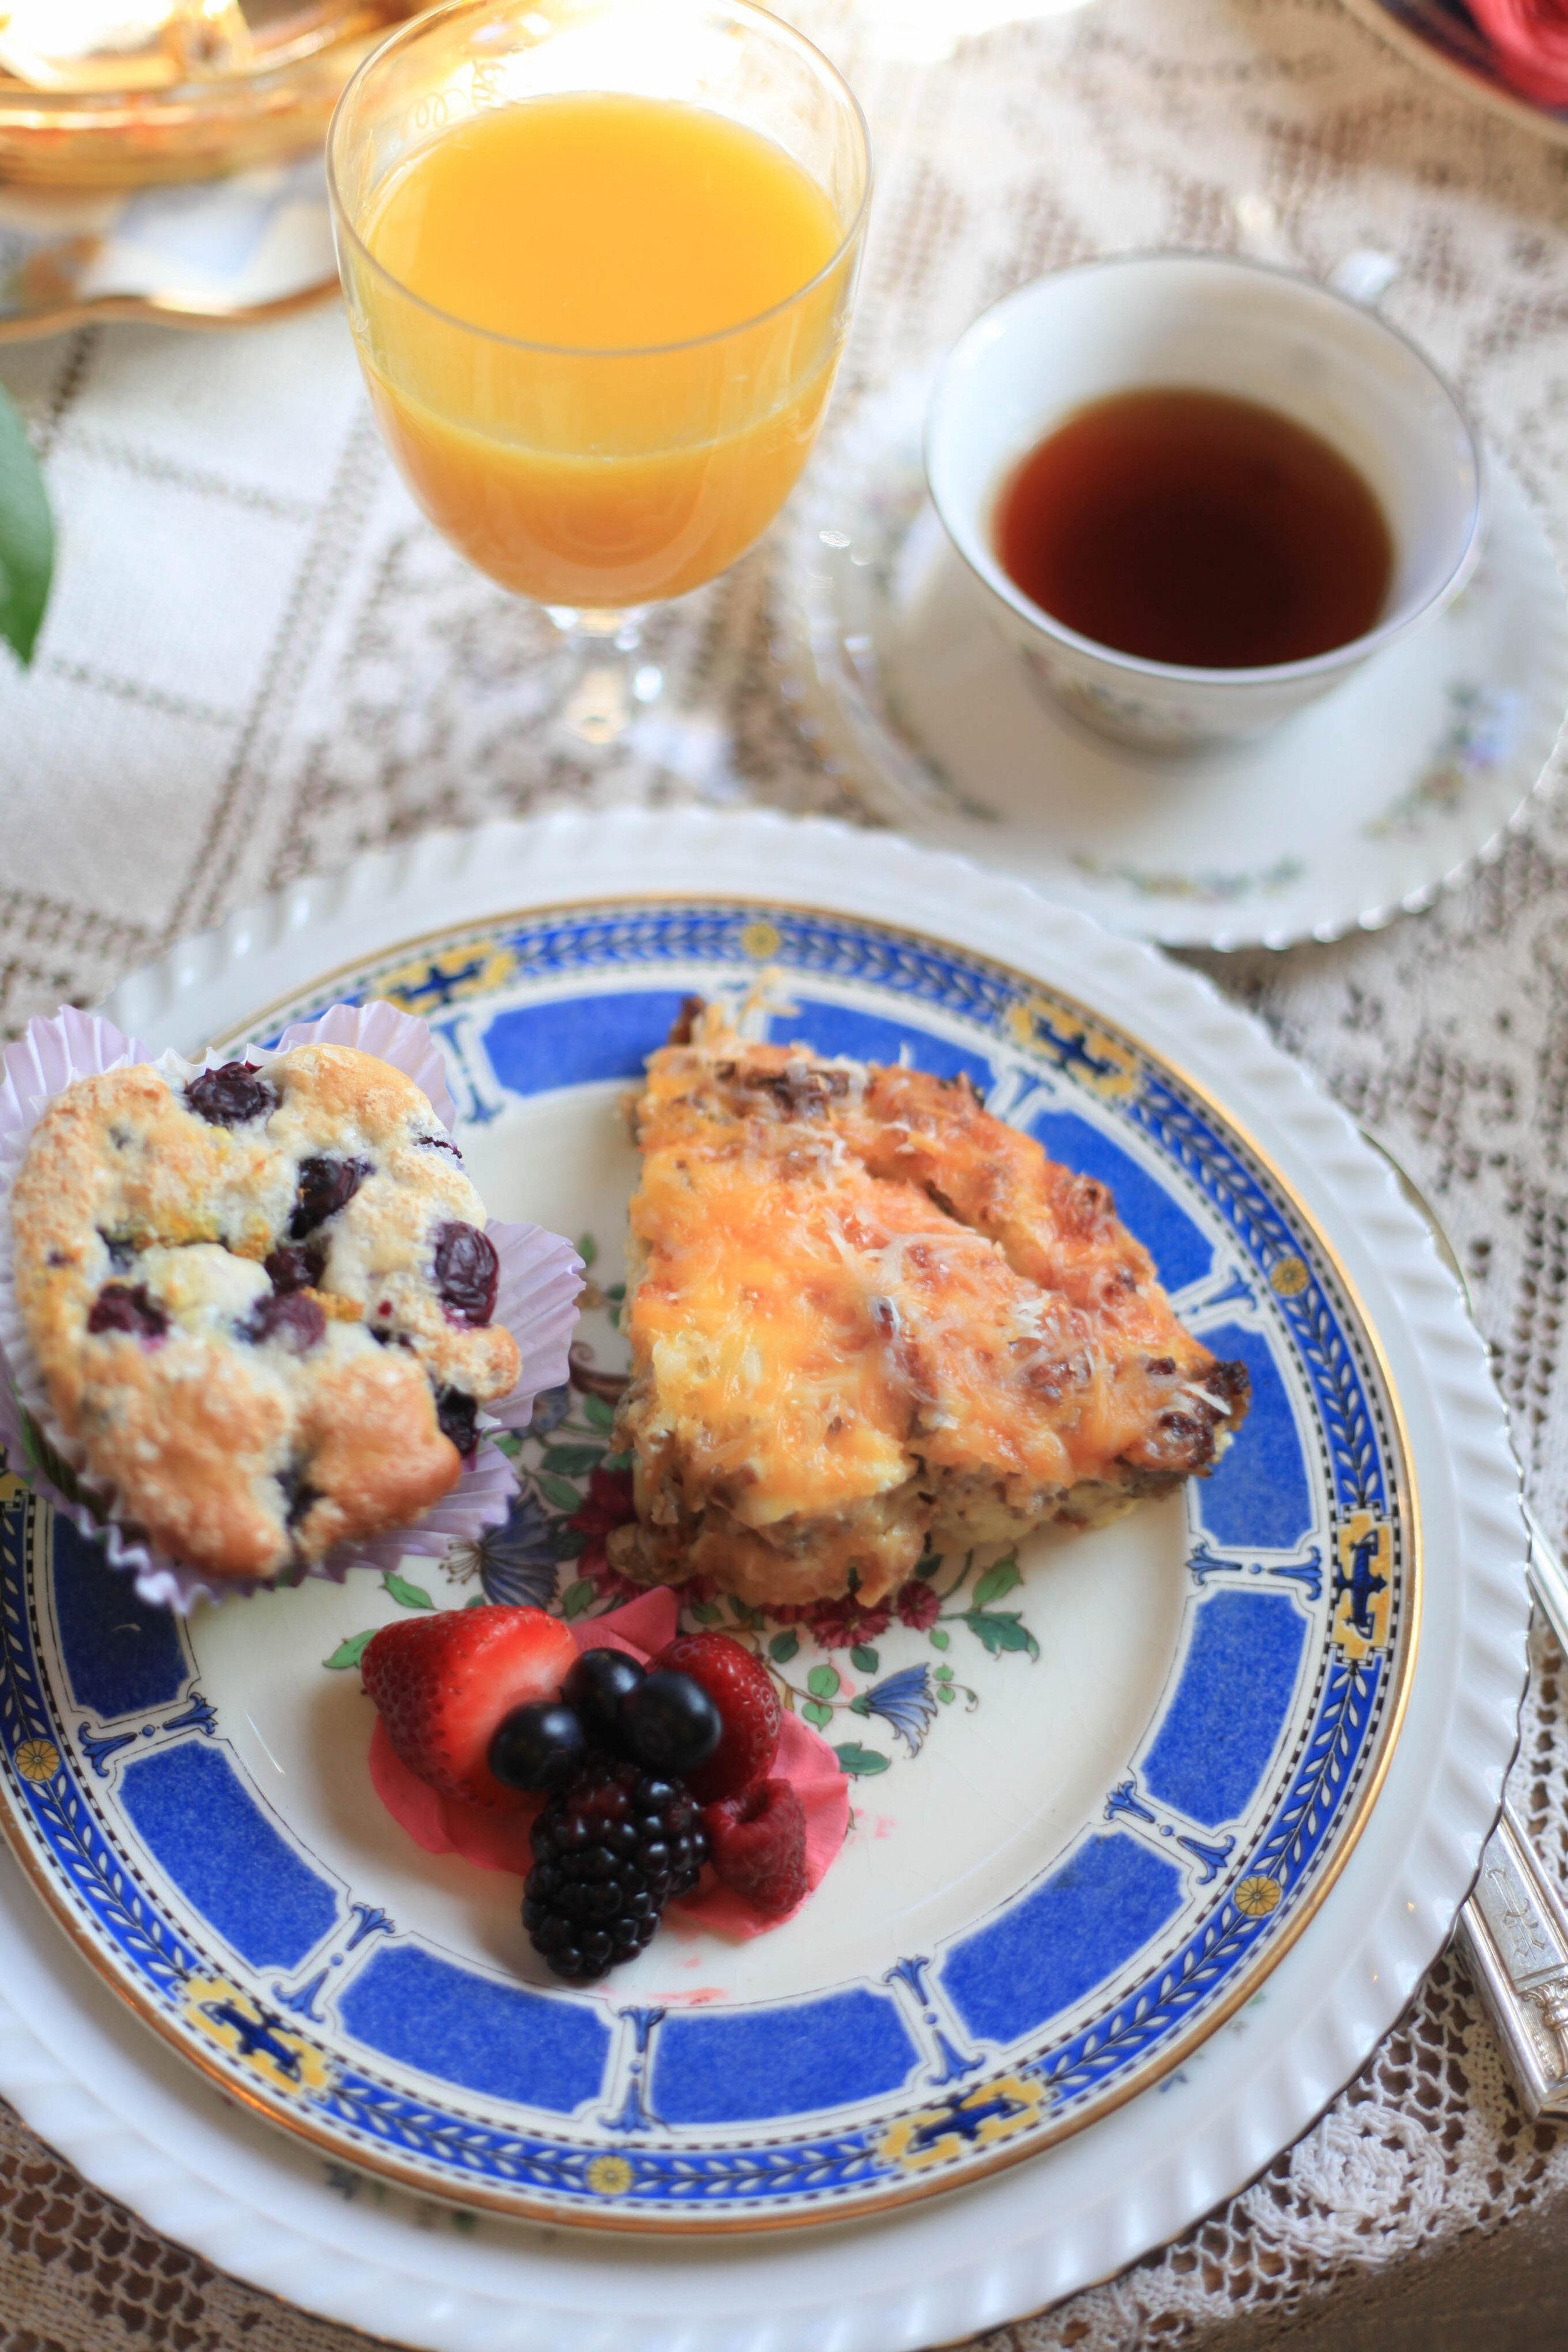 Clutch+Guide+Breakfast+Styled+Shoot-PASS+Edits-0079.jpg